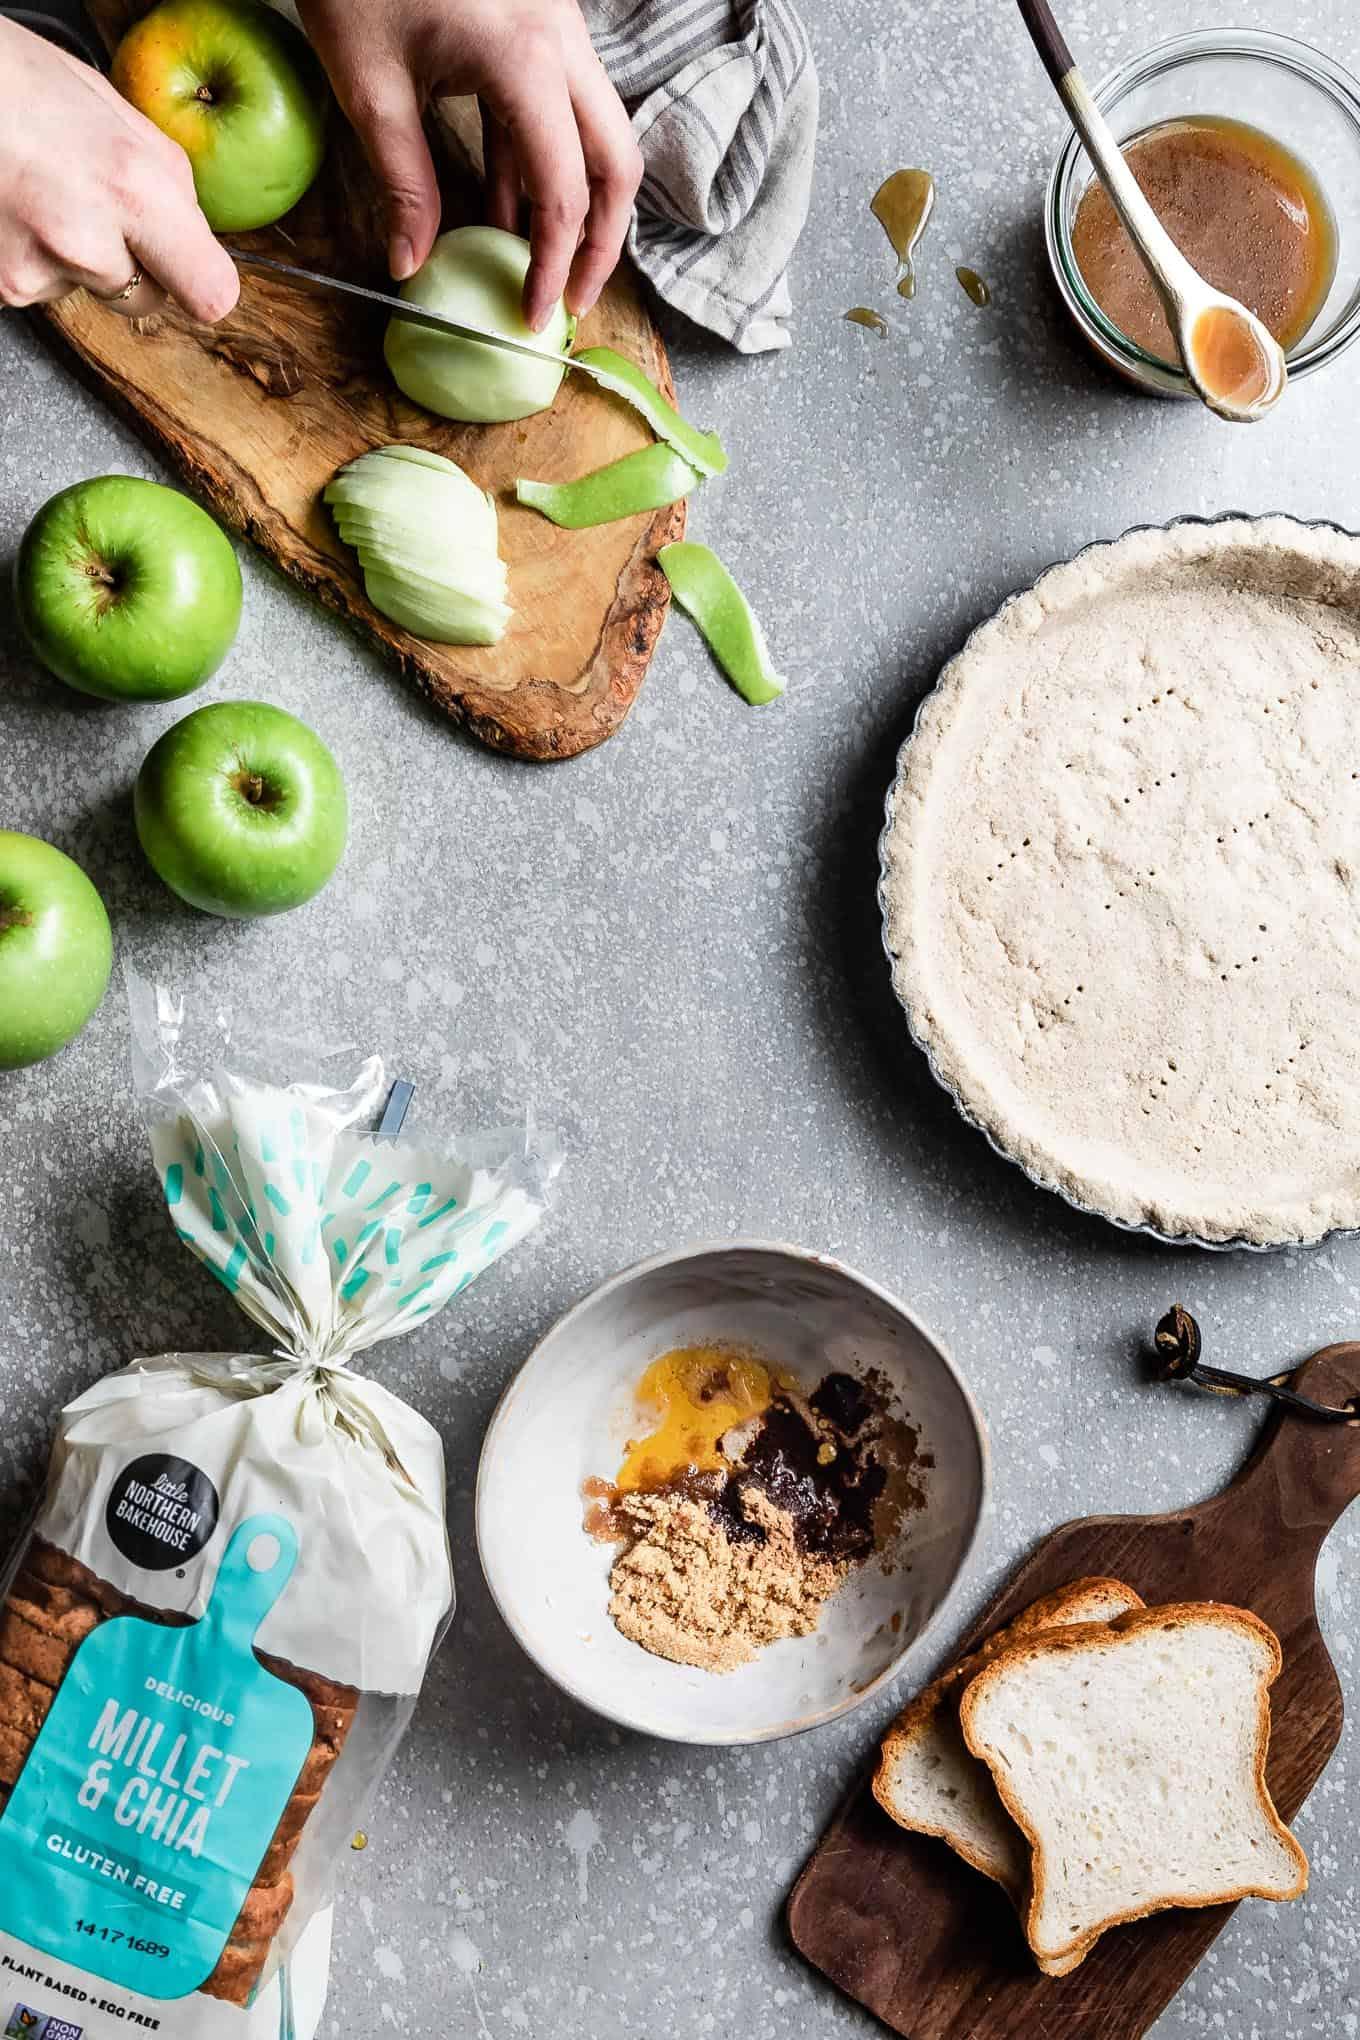 Gluten-Free Vegan Apple Tart with Caramel